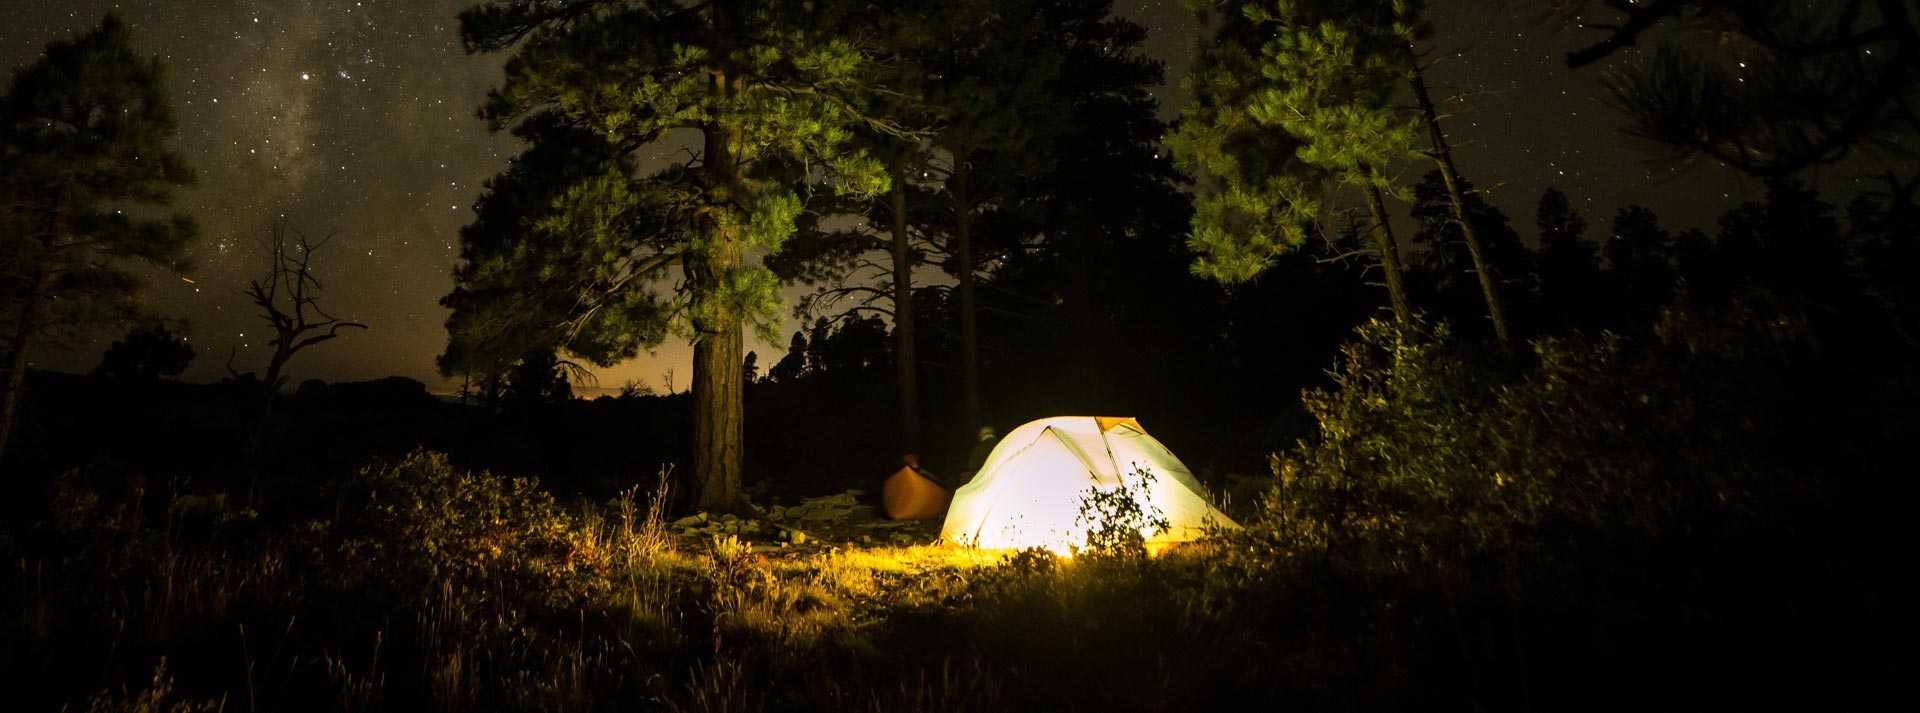 Zelt nachts im Wald